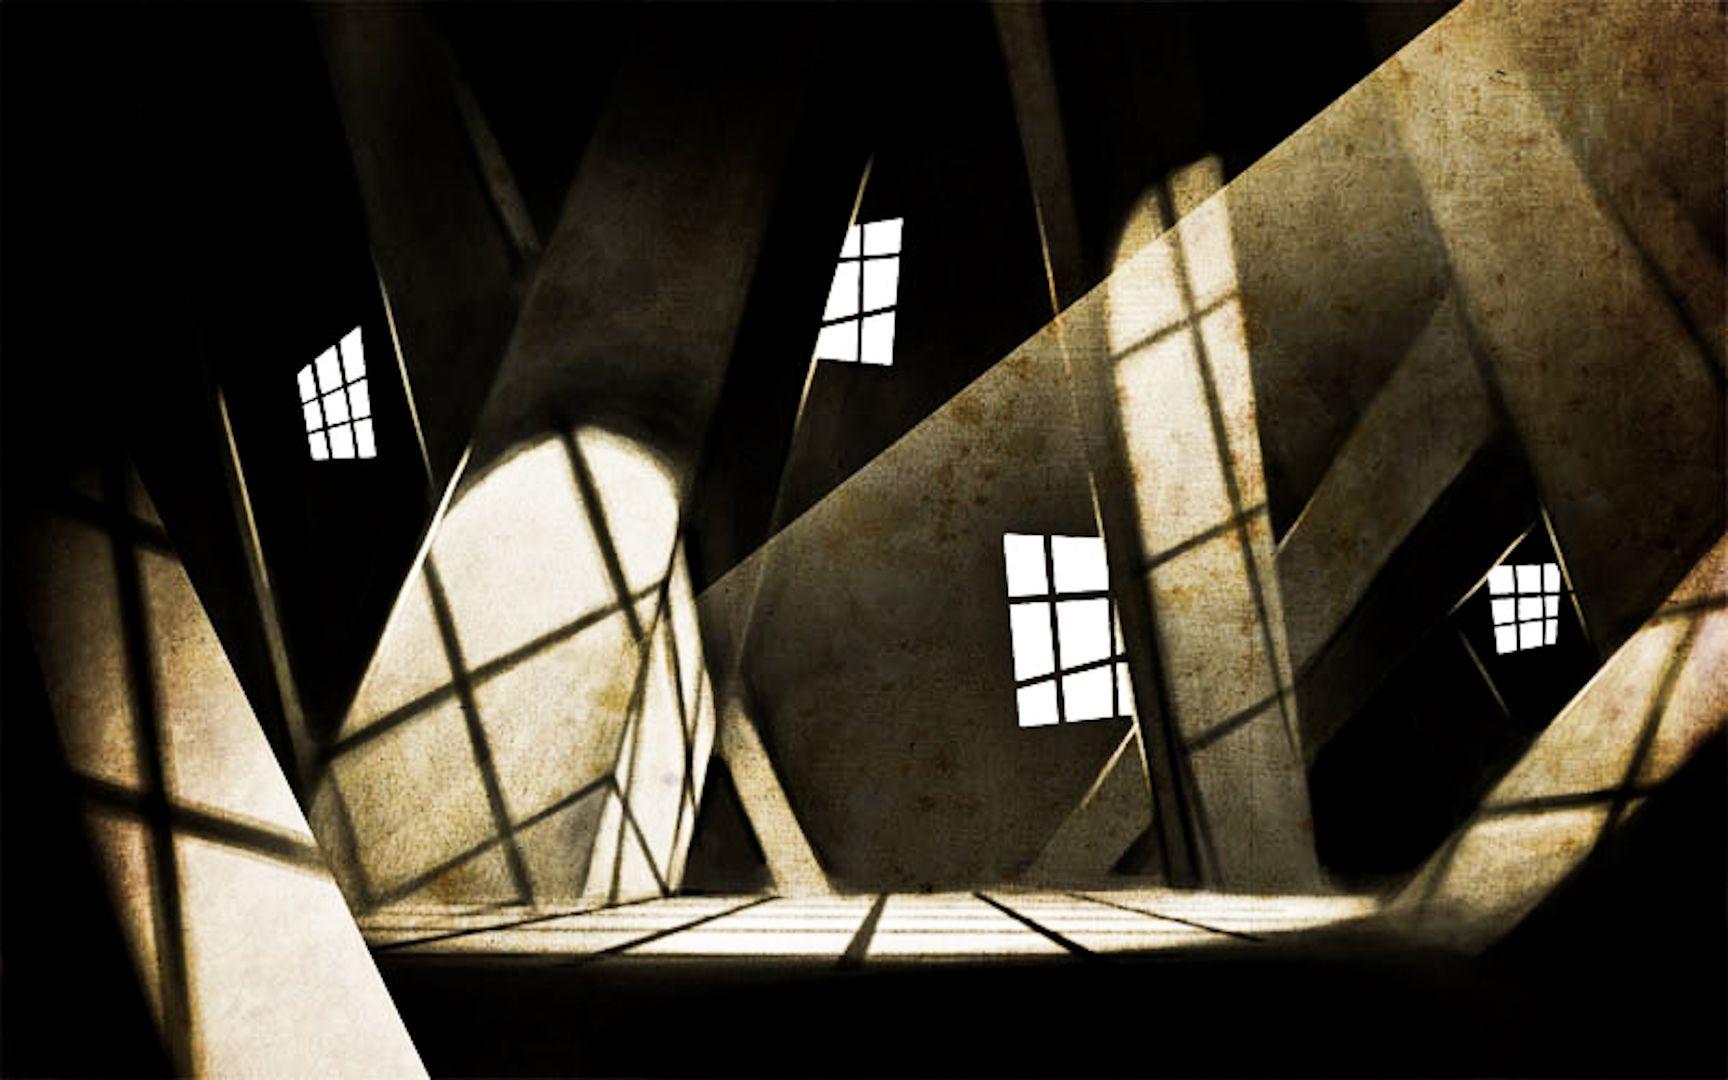 The Cabinet of Dr. Caligari – Robert Wiene (1919)